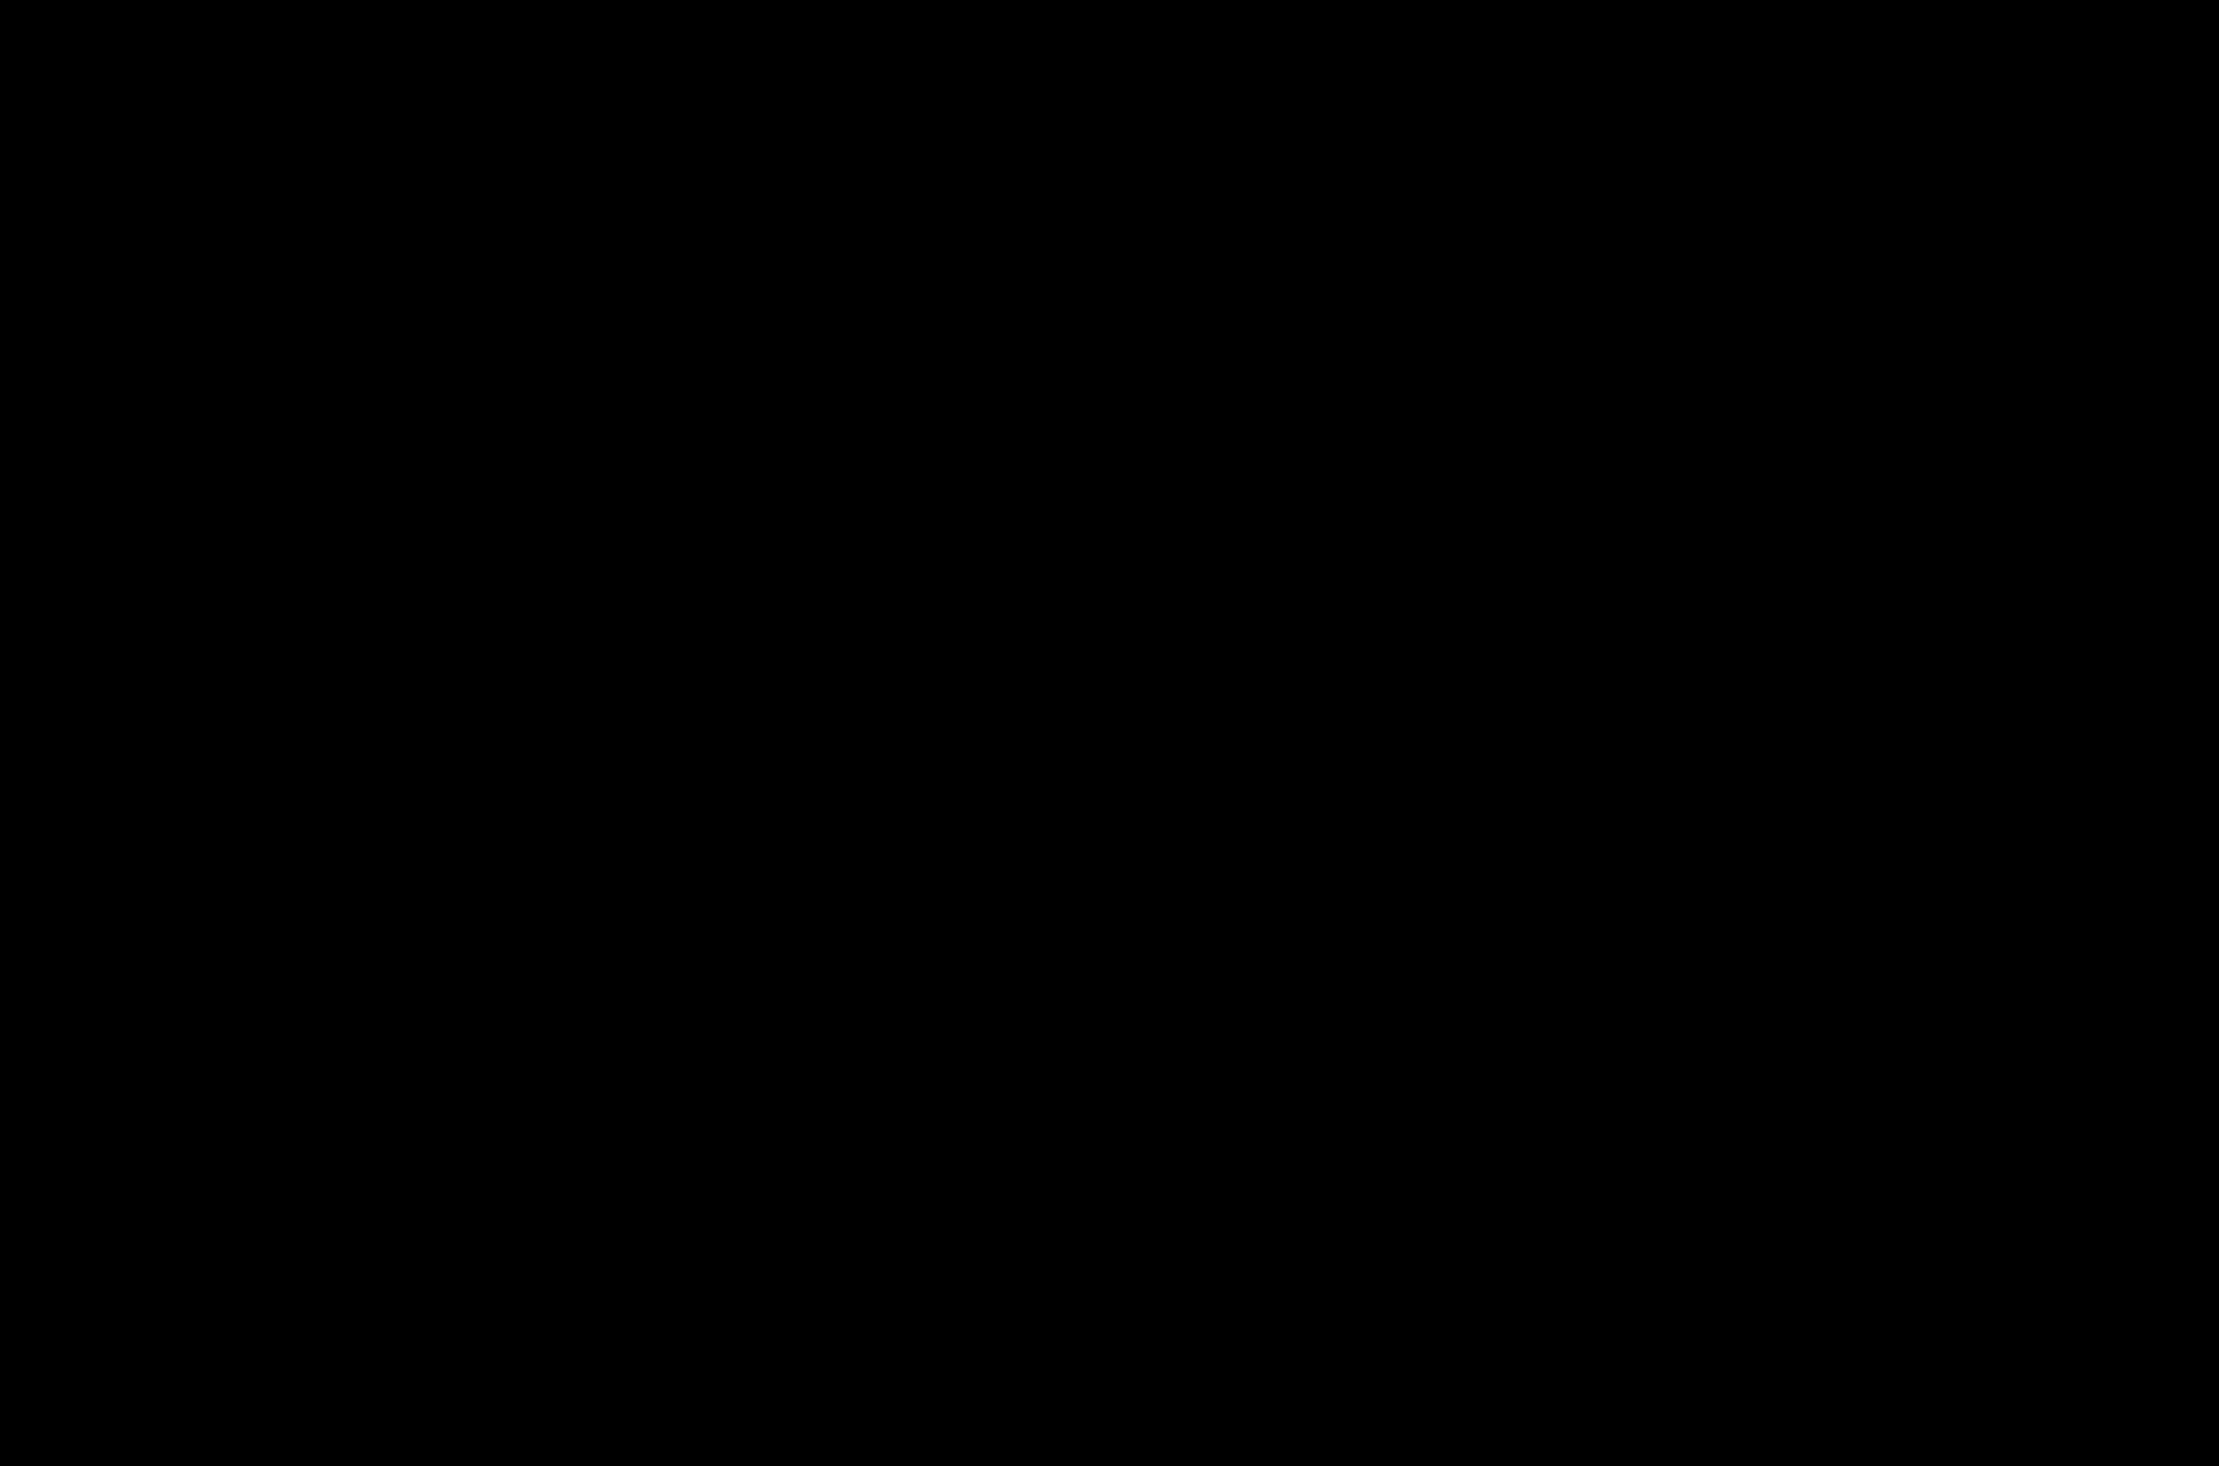 KD03_sig_logo_-black